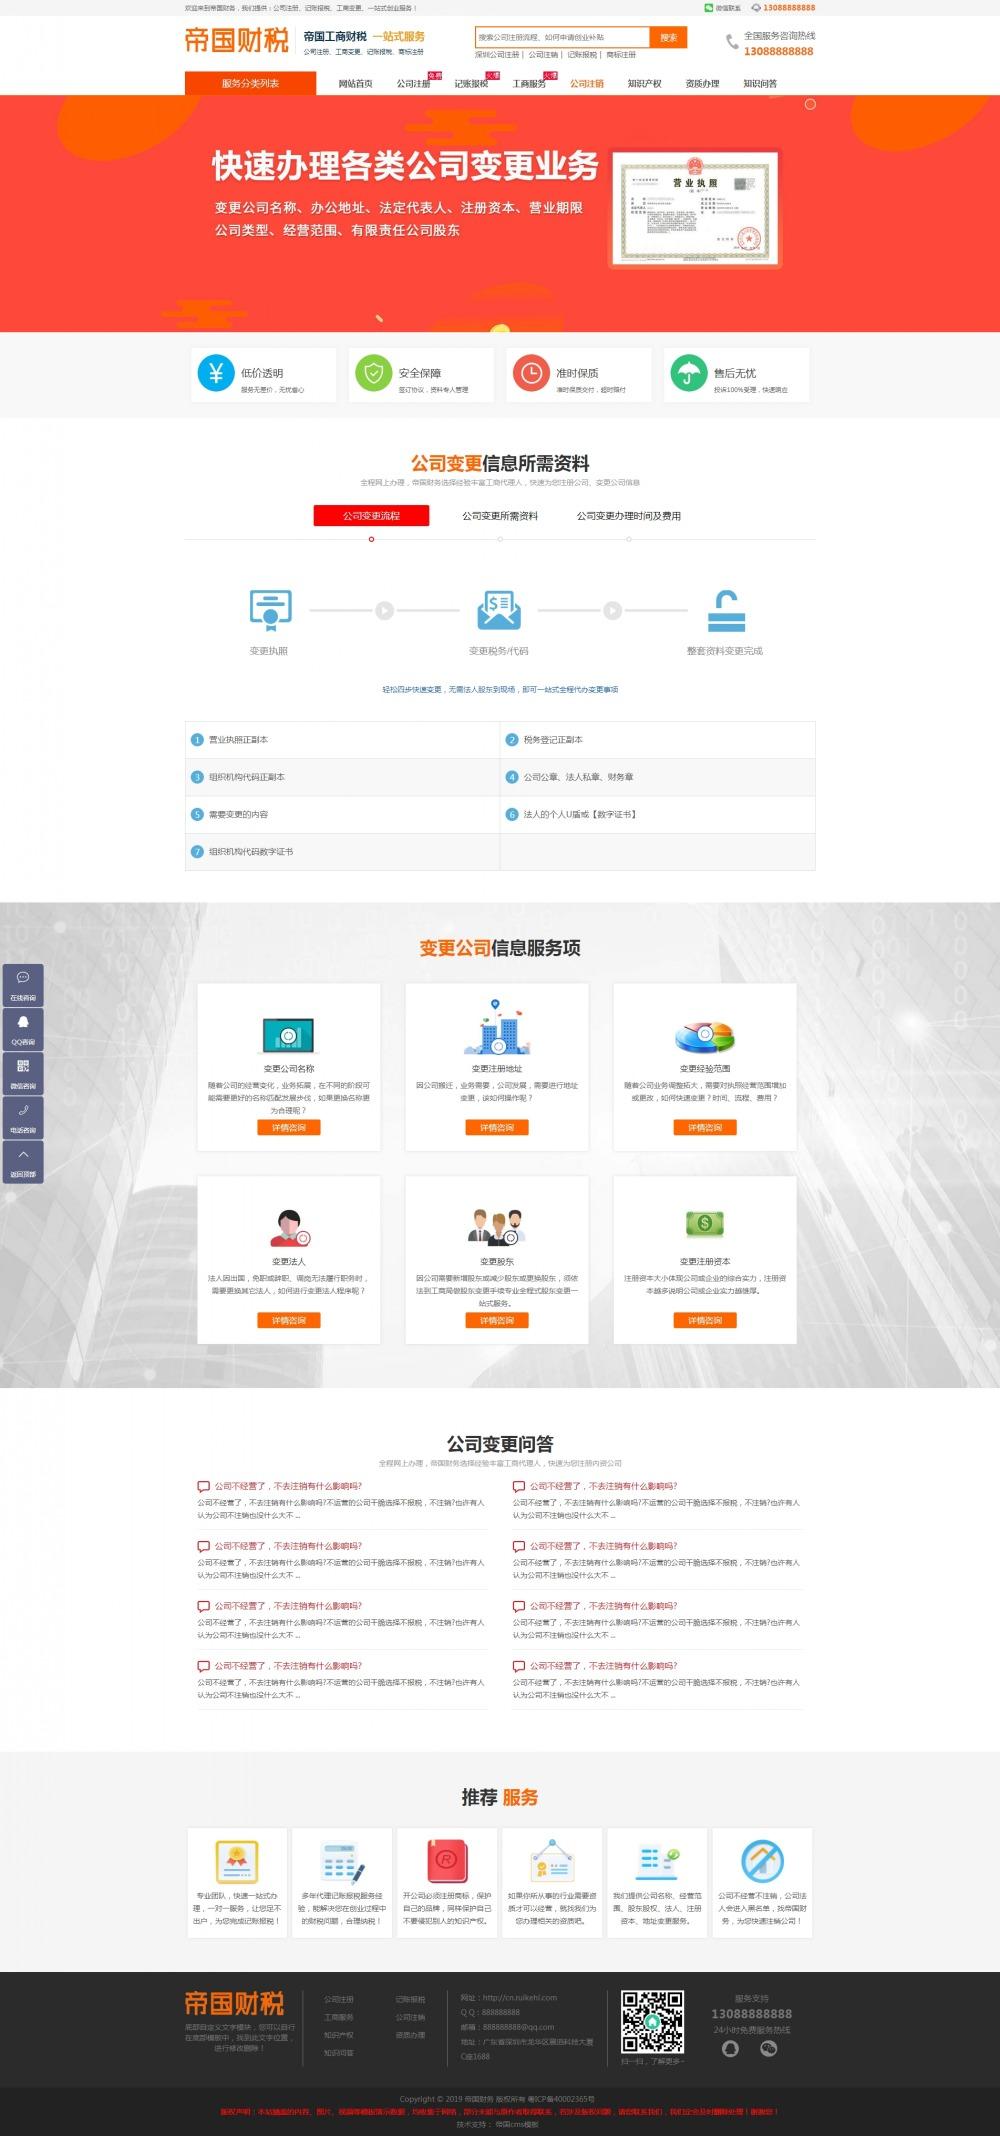 [DG-0181]注册公司记账报税帝国cms模板,商标注册财税财务帝国网站模板 企业模板 第5张